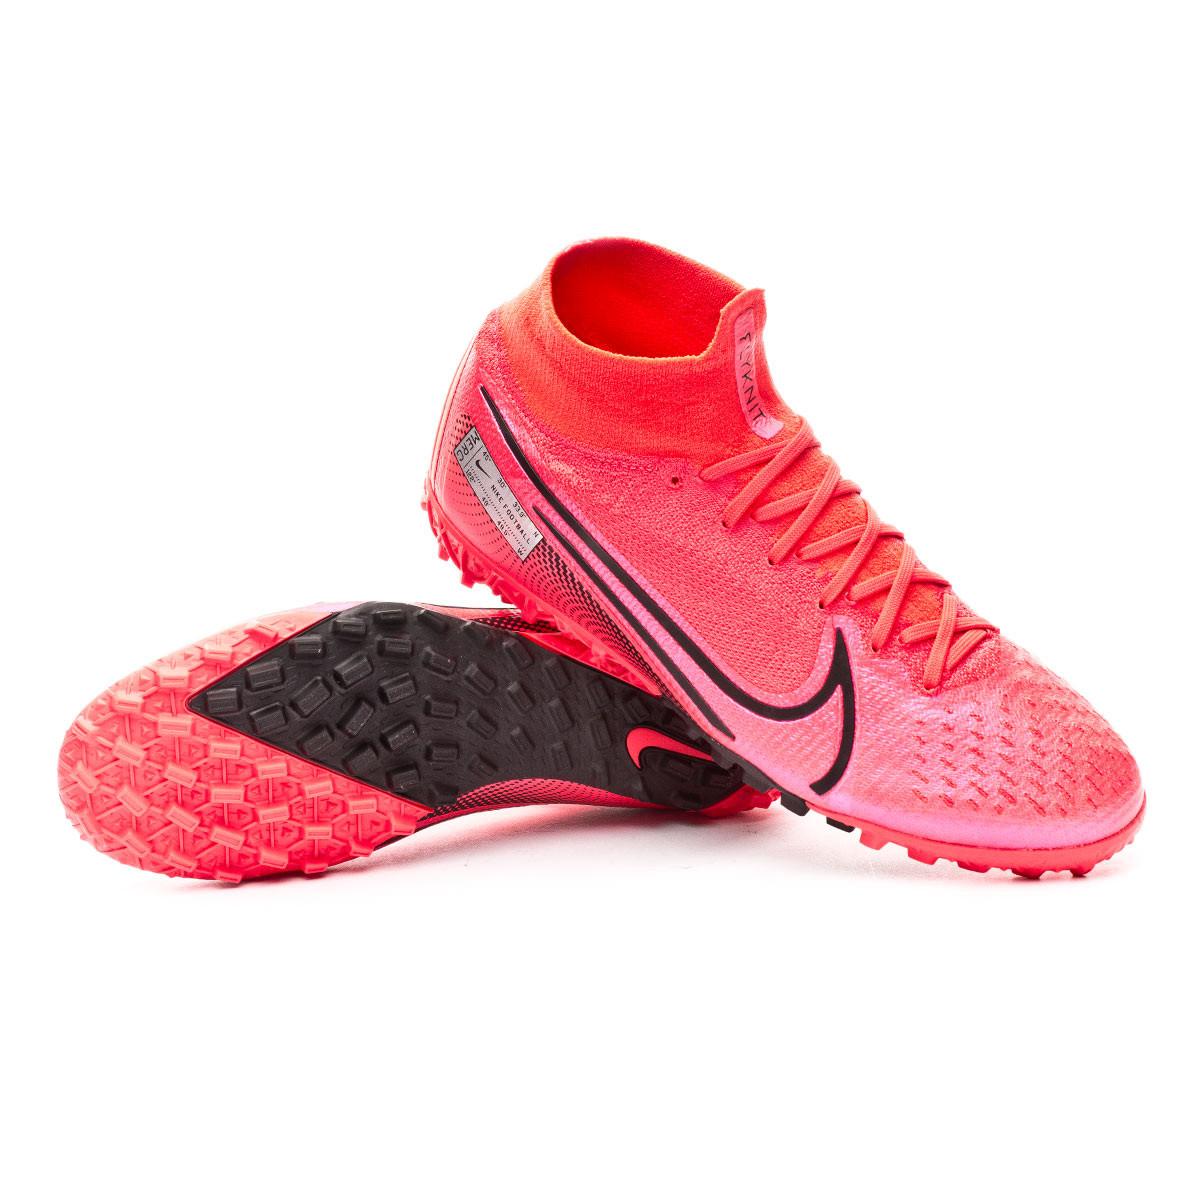 Asistir Feudo tumor  Football Boot Nike Mercurial Superfly VII Elite Turf Laser crimson-Black -  Football store Fútbol Emotion